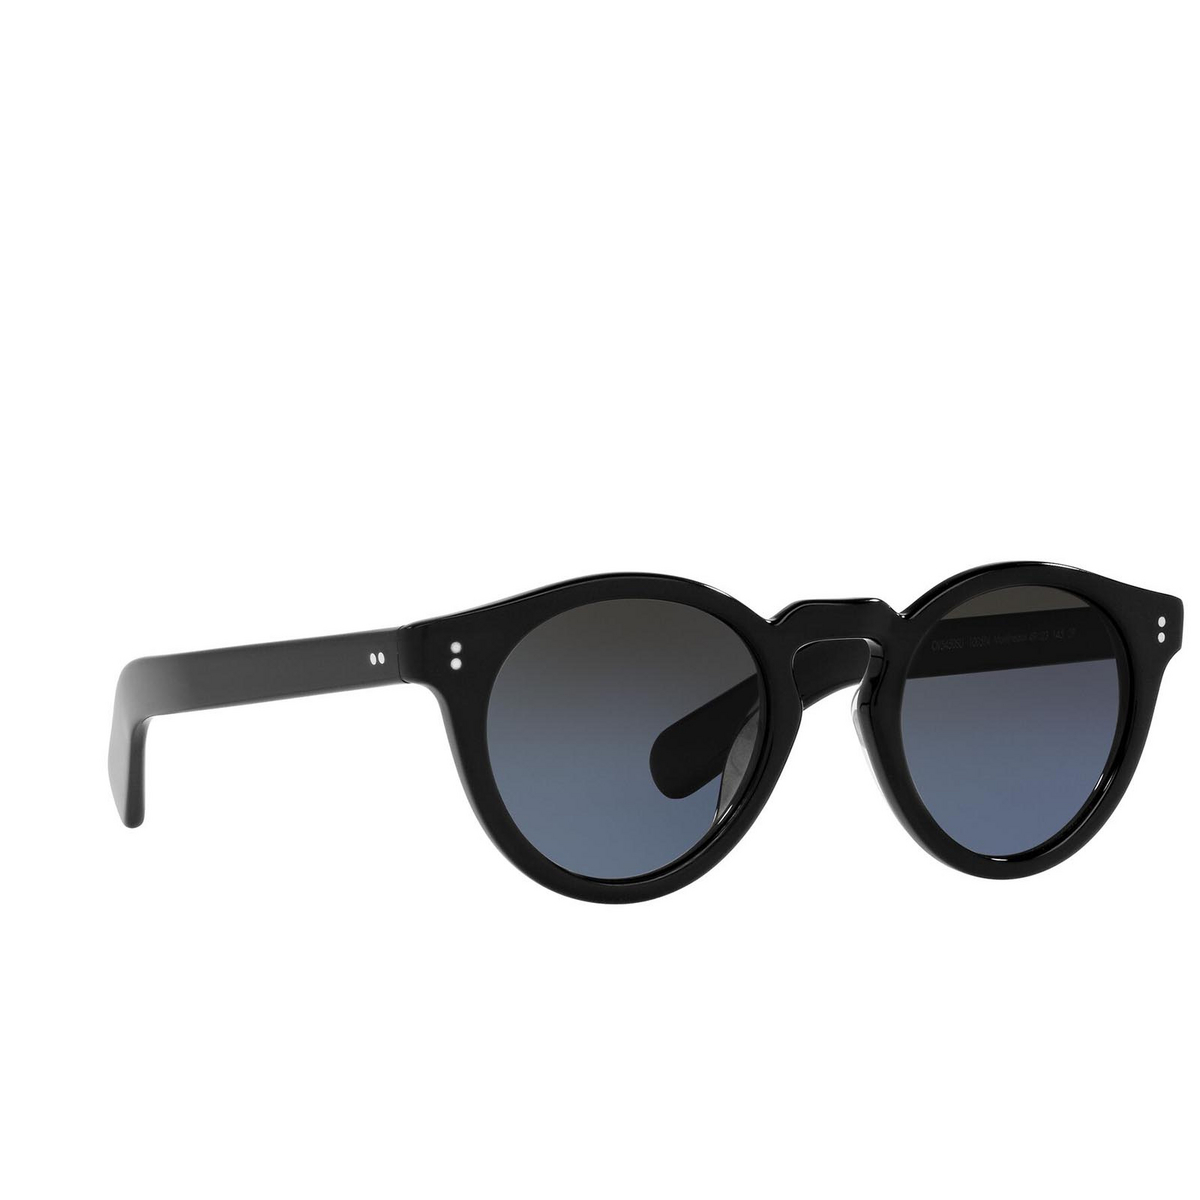 Oliver Peoples® Round Sunglasses: Martineaux OV5450SU color Black 1005P4 - three-quarters view.